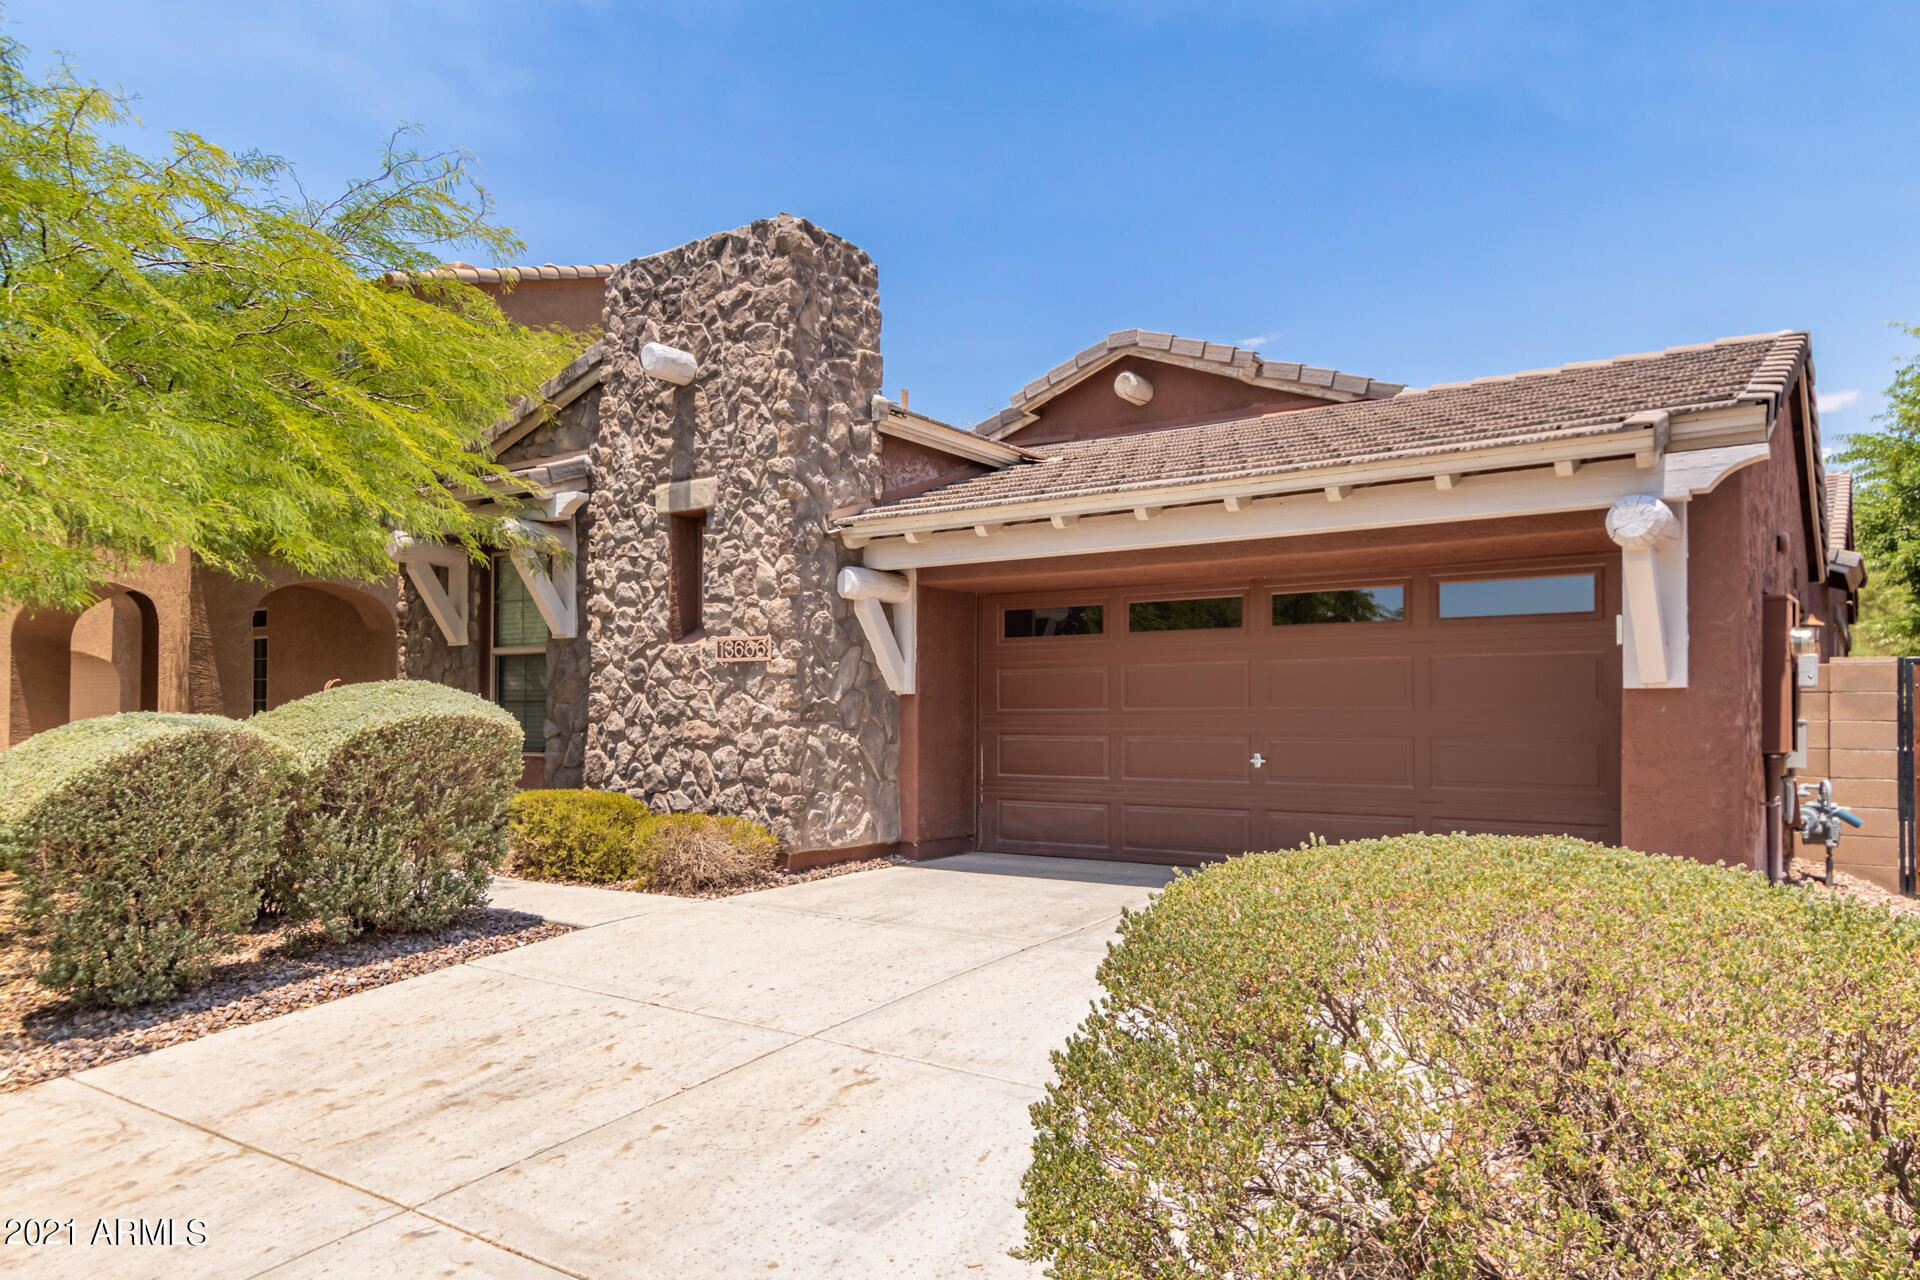 13666 W CHAPAROSA Way, Peoria, AZ 85383 - MLS#: 6258449